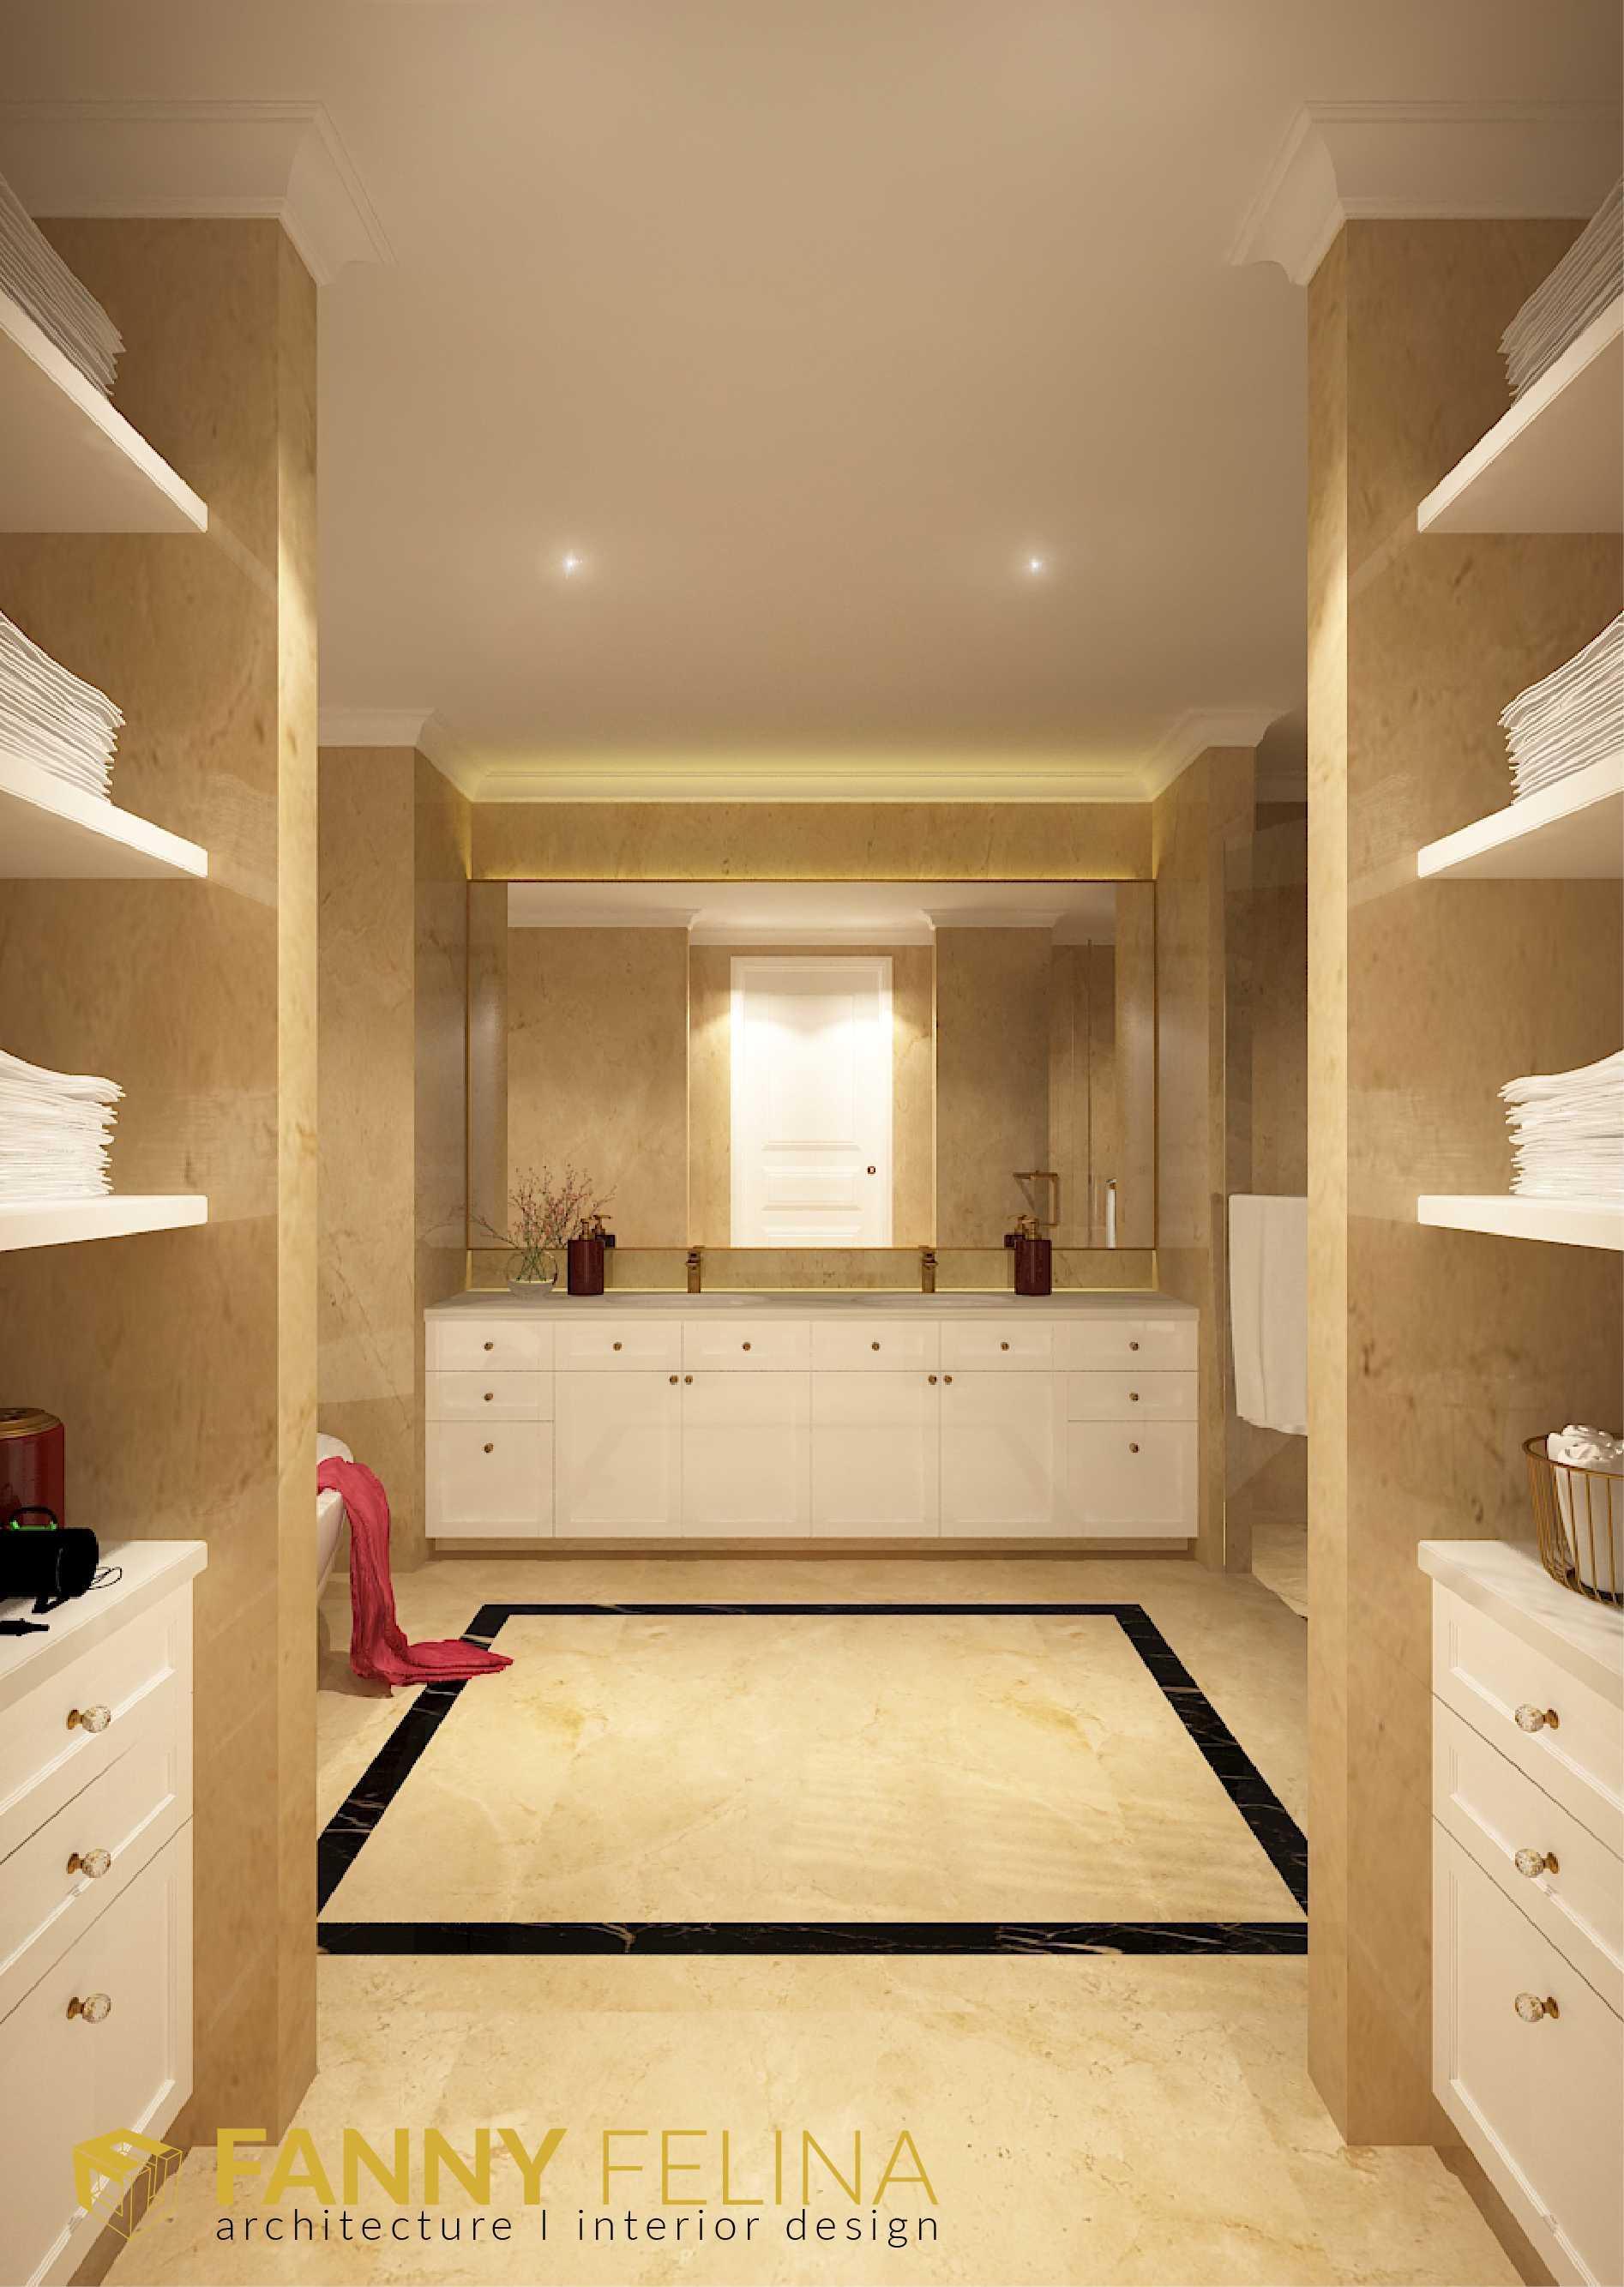 Fanny Felina Architecture & Interior Design R House Surabaya, Kota Sby, Jawa Timur, Indonesia Surabaya, Kota Sby, Jawa Timur, Indonesia R 04 Classic,klasik,modern  40003